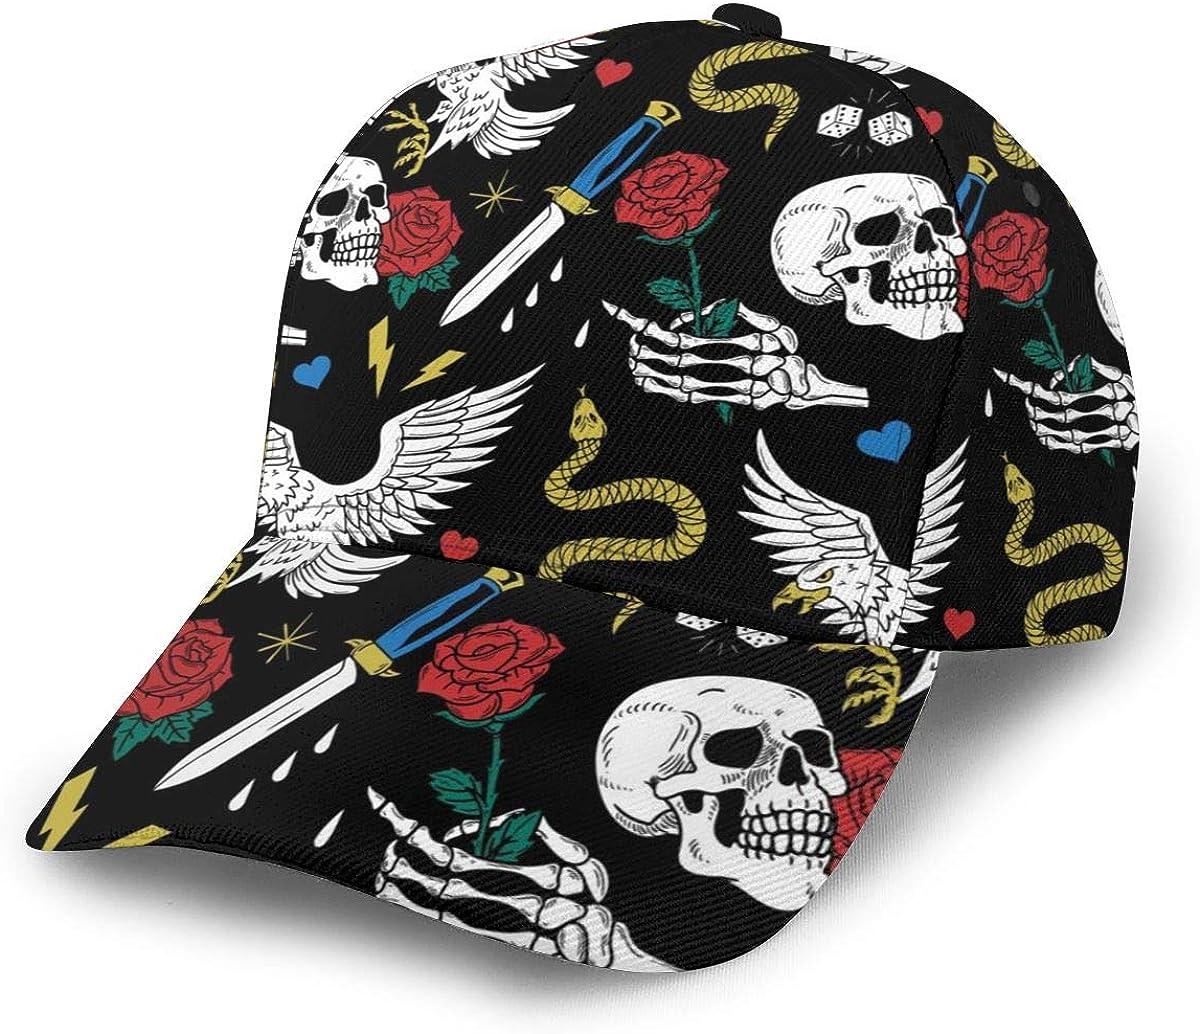 HHTZTCL Old School Tattoo Line Pattern Baseball Cap Adjustable Washed Cotton Dad Hat Hats Black